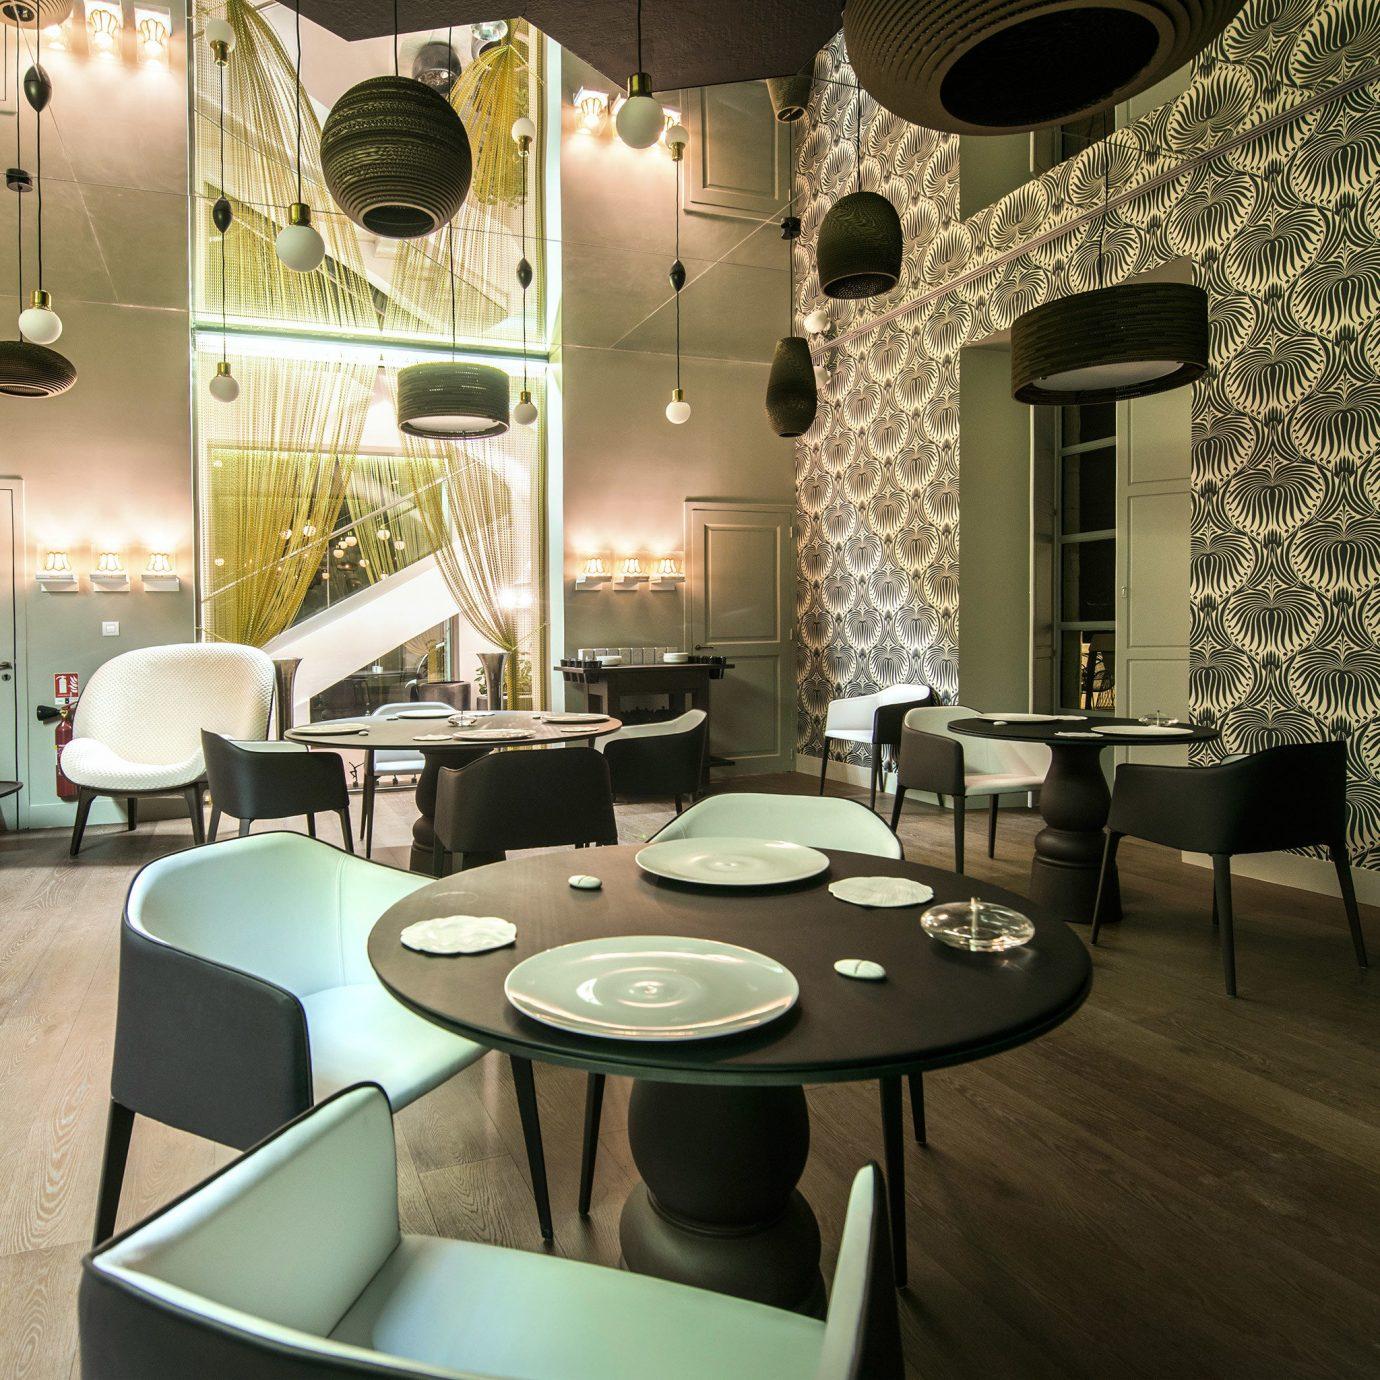 Dining Drink Eat Honeymoon Luxury Modern Romance Wellness chair property living room lighting Lobby